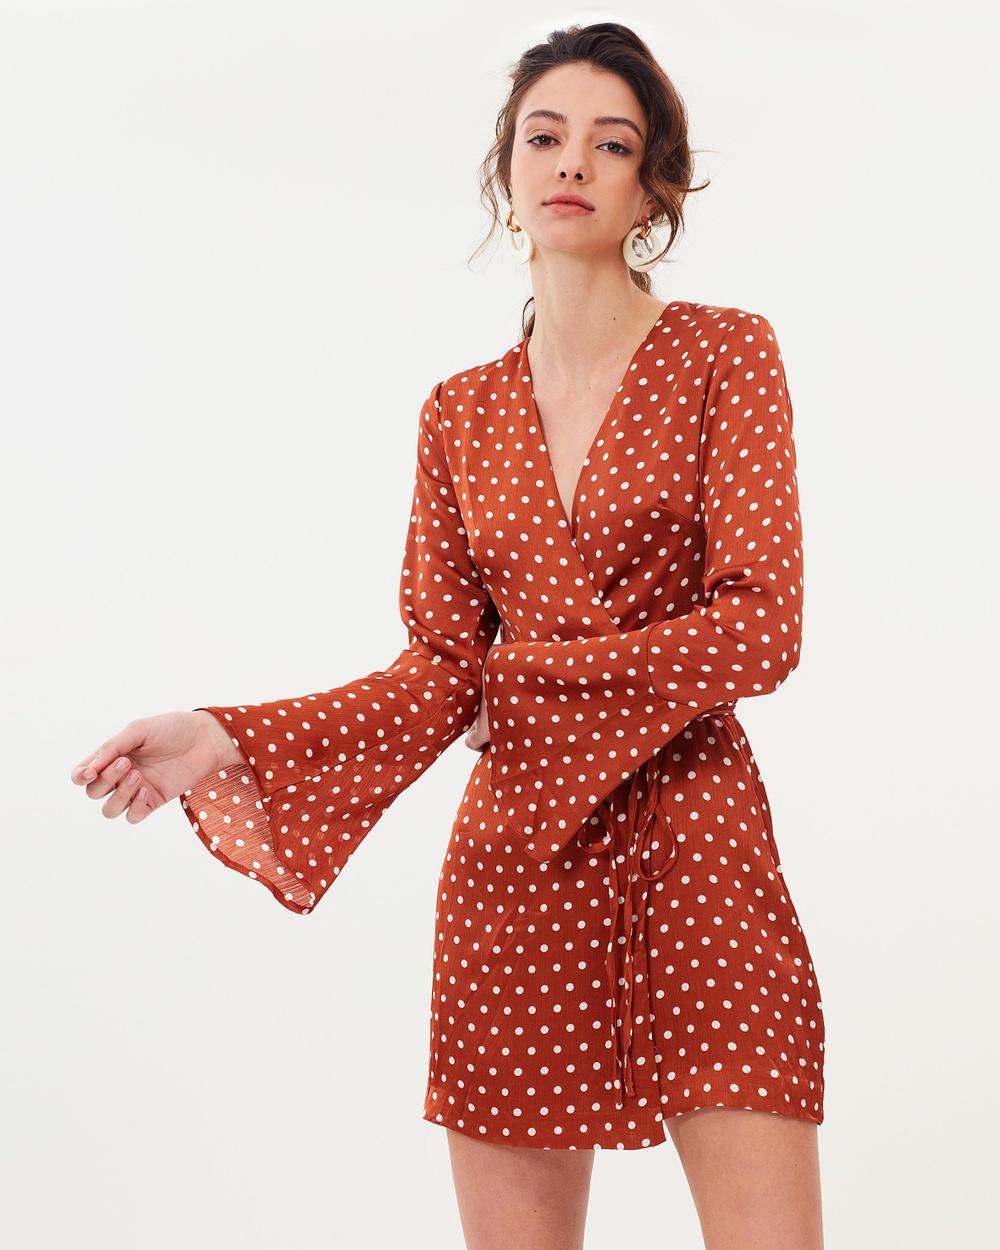 Lulu & Rose Anya Wrap Dress Printed Dresses Rust Spot Anya Wrap Dress